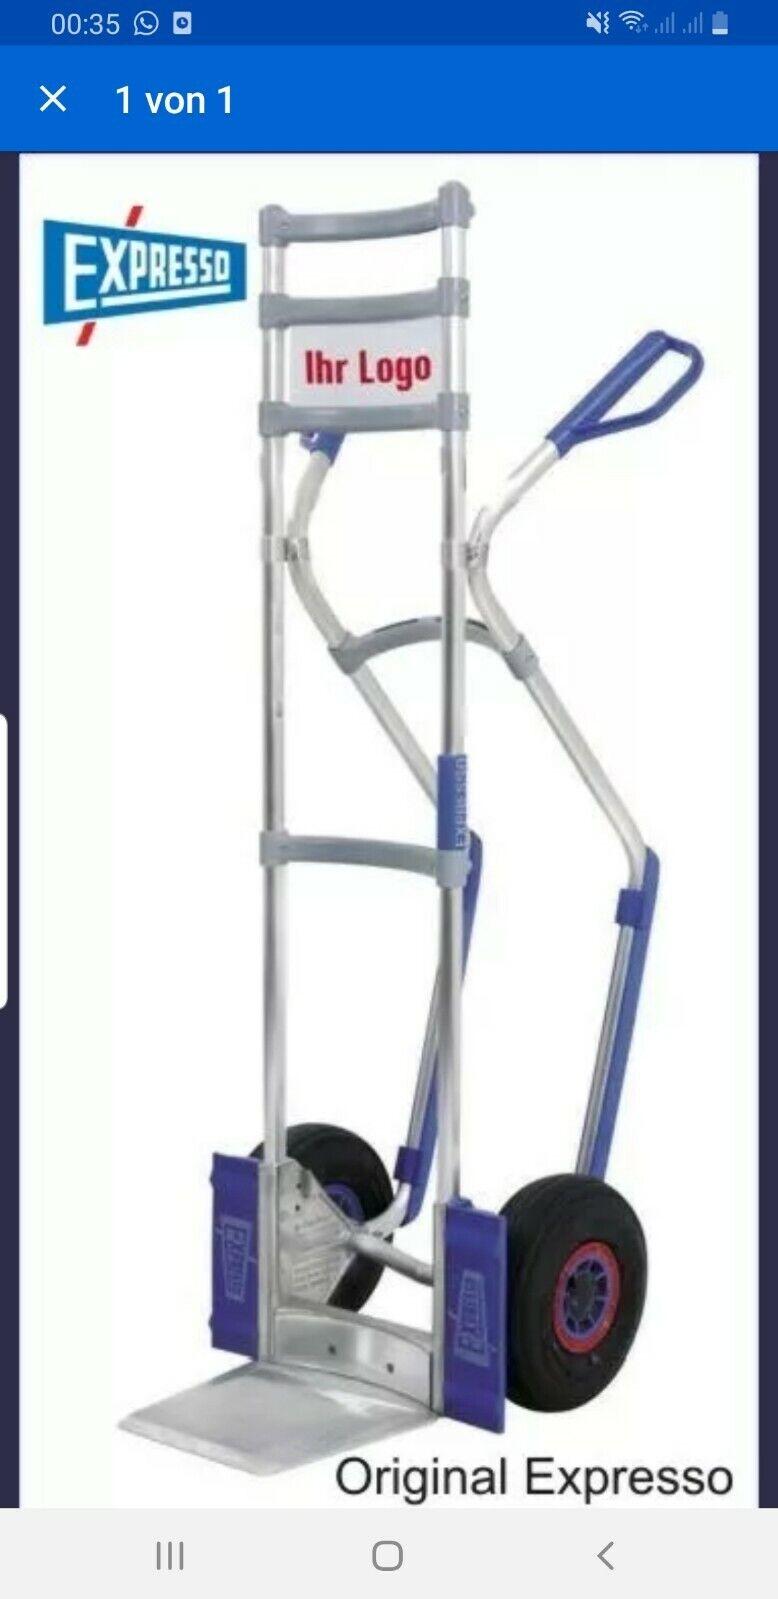 Sackkarre 250 kg Tragkraft Luftbereifung Stapelkarre Luftreifen Transportkarre